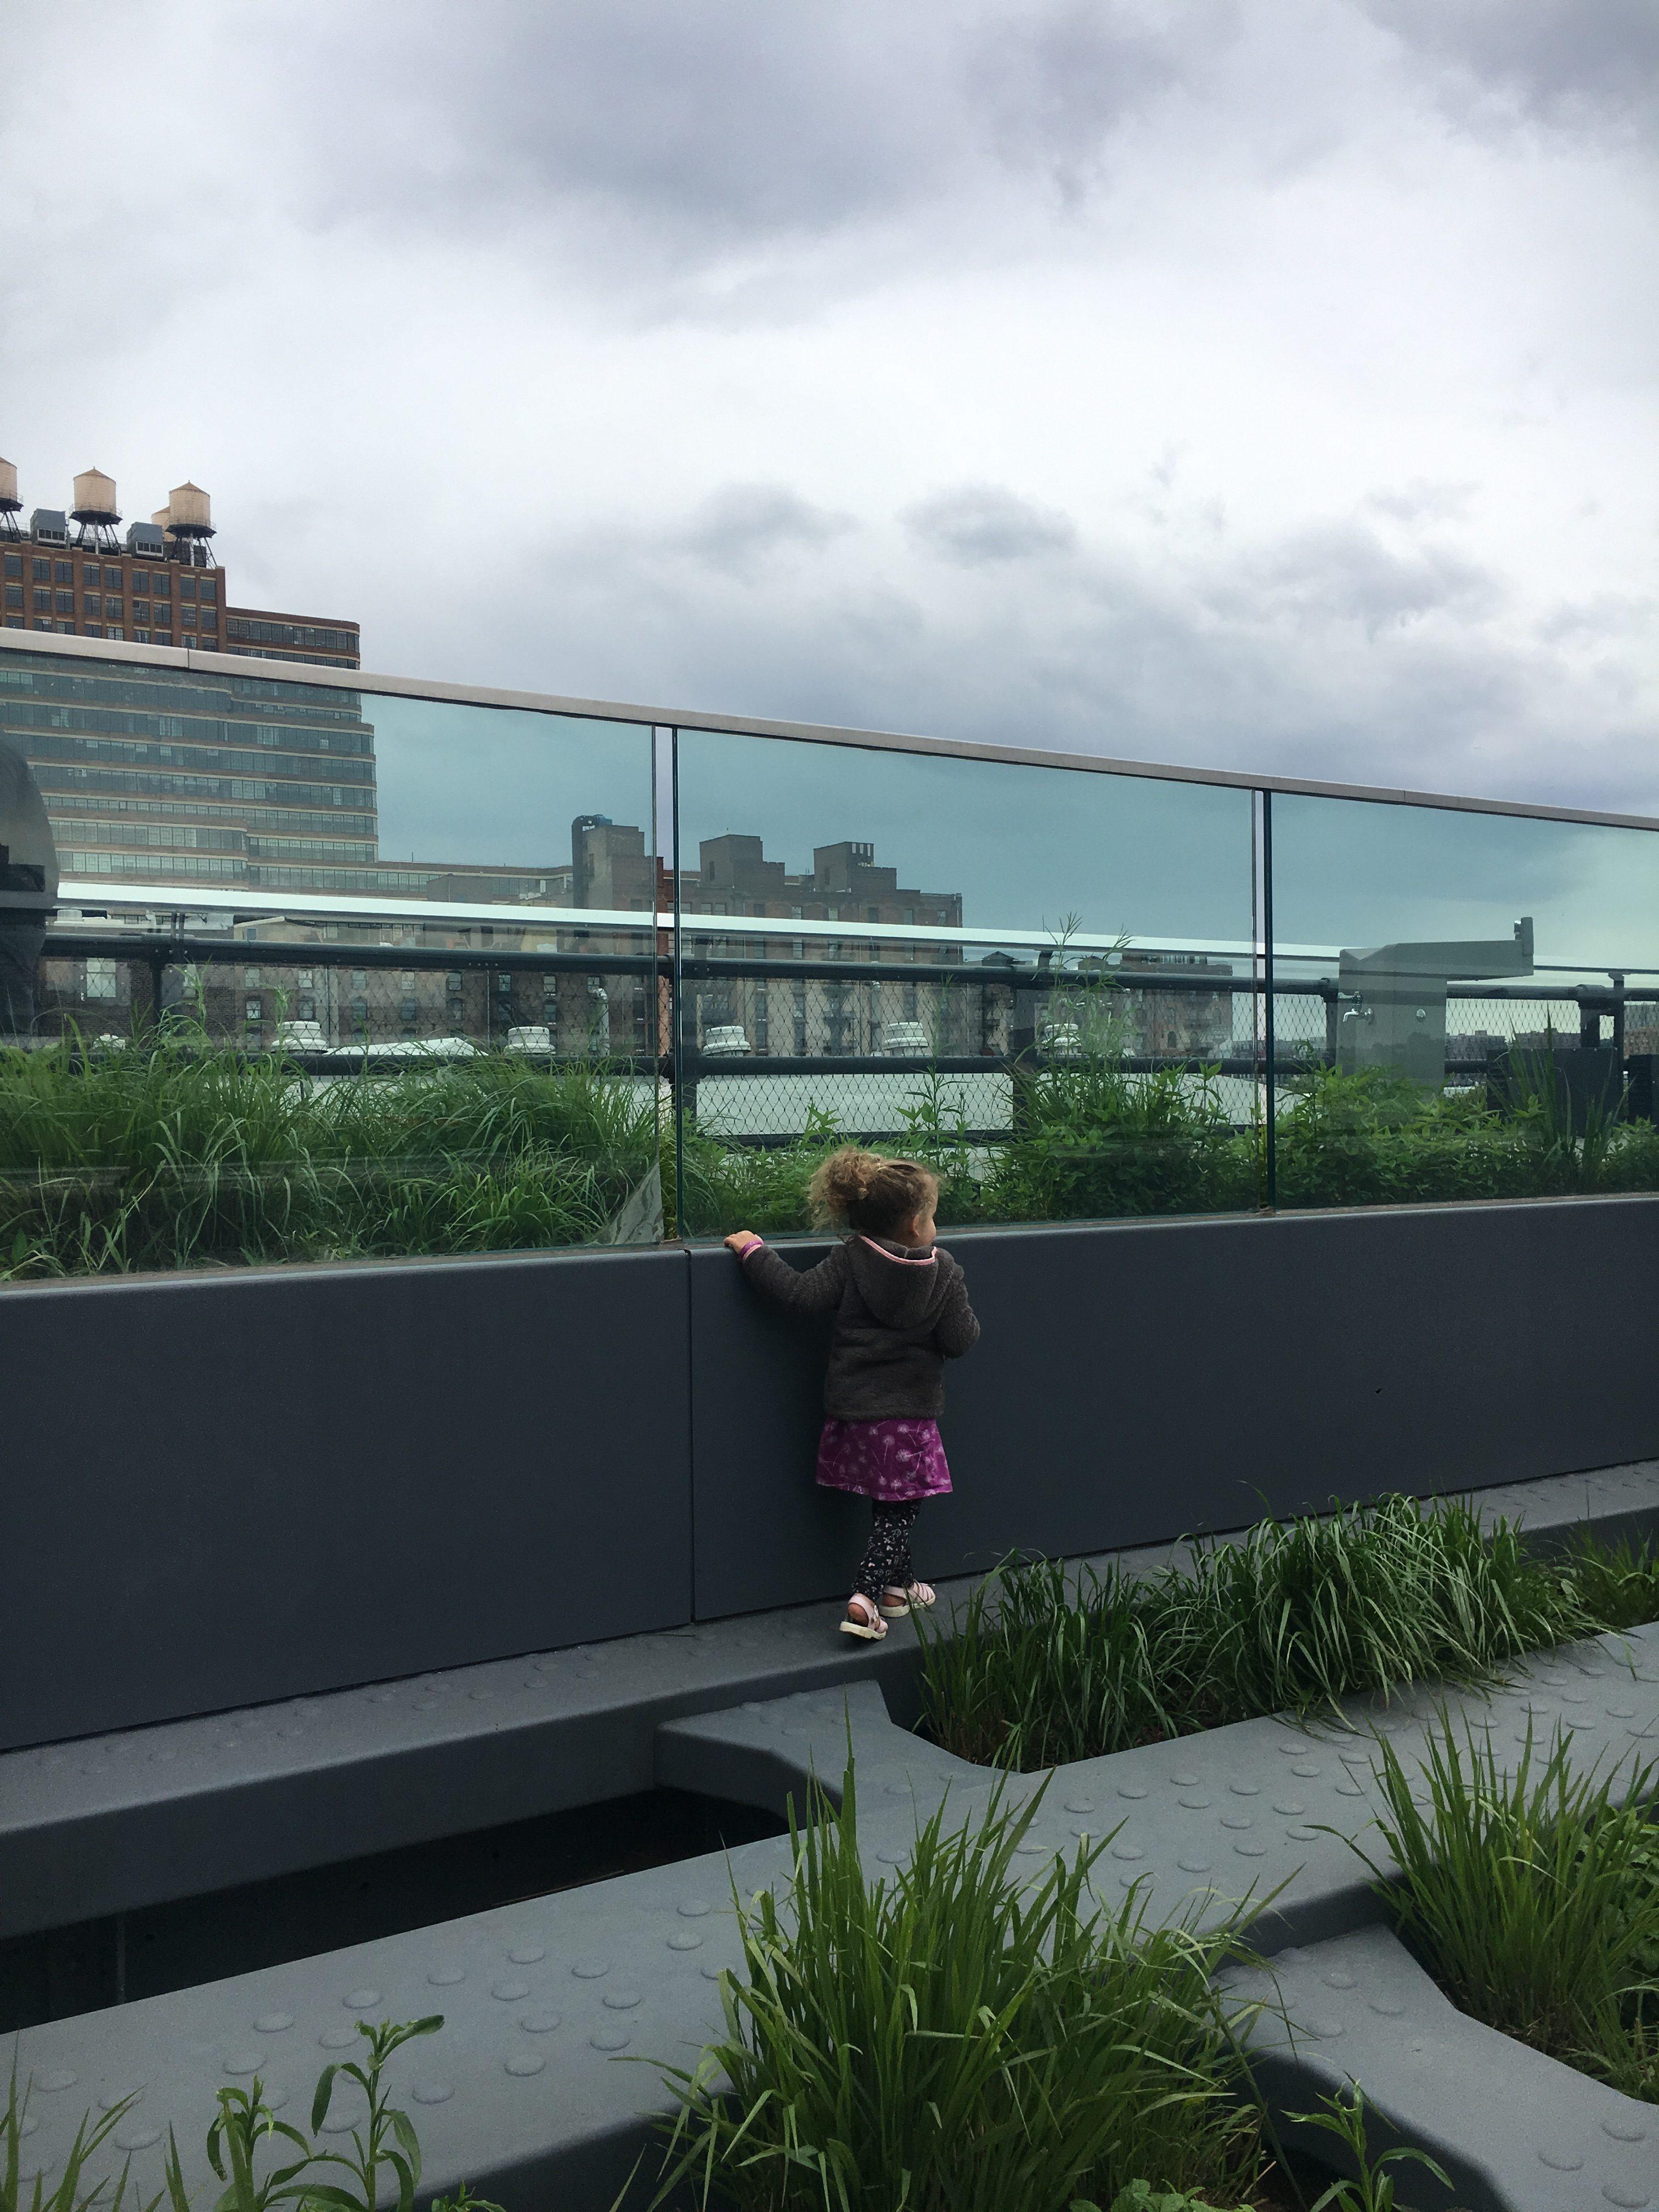 high line nyc: Pershing Square Beams